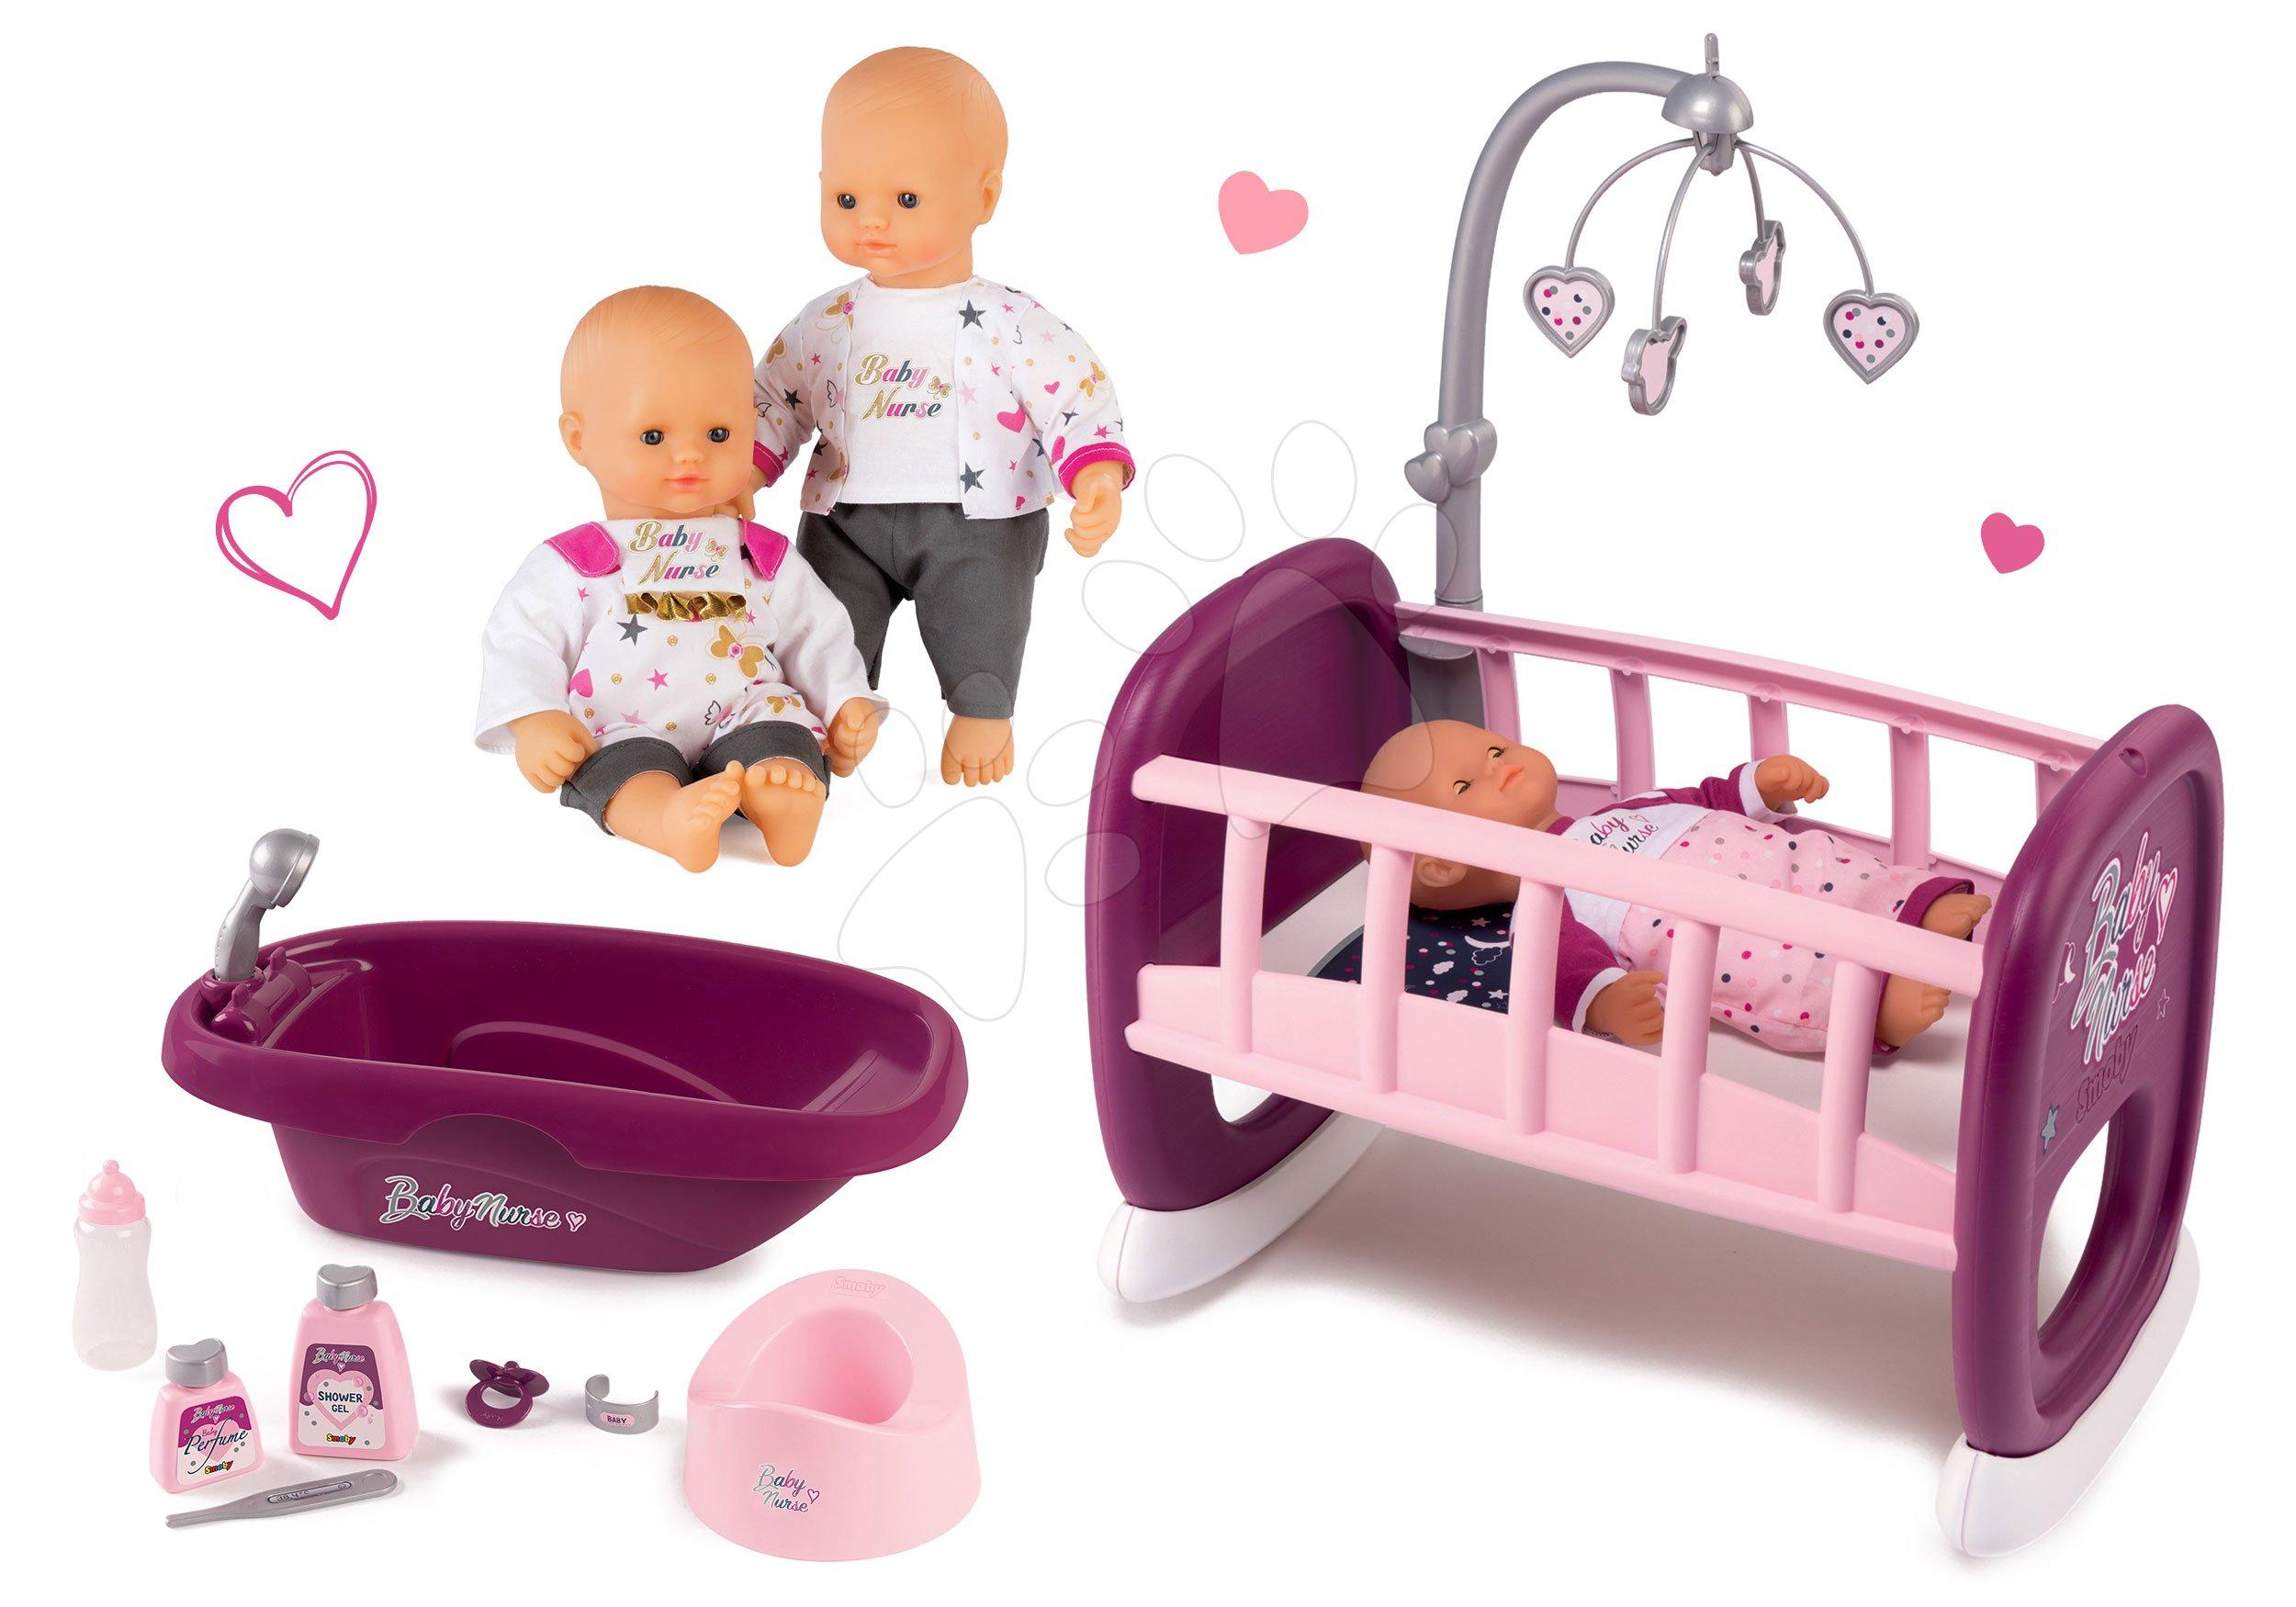 Smoby set bábika Baby Nurse Zlatá edícia, kolíska a vanička Baby Nurse 220100-11